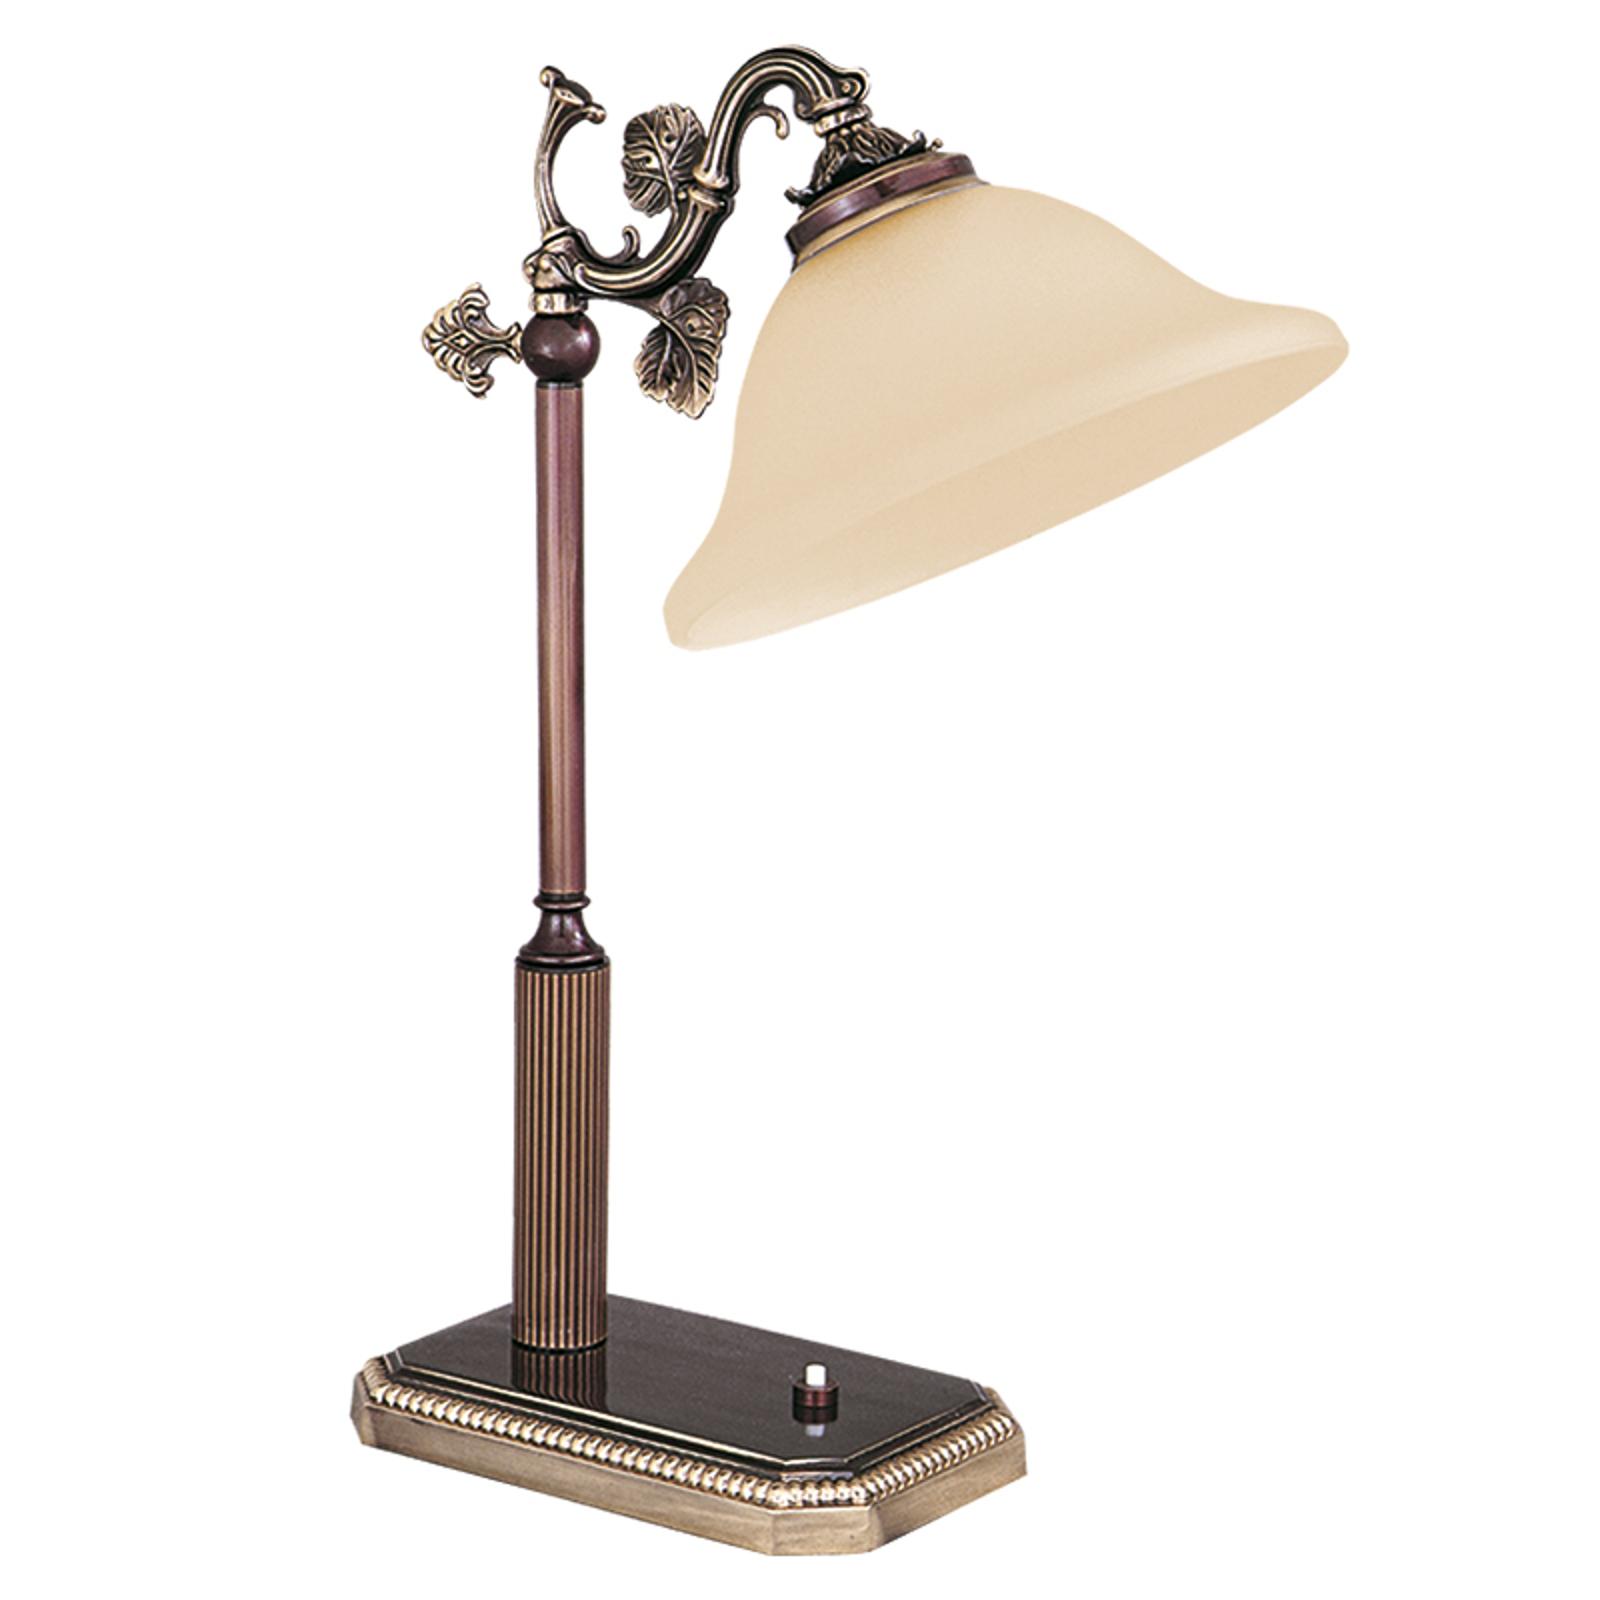 Mooie tafellamp uit de serie RIALTO, amber